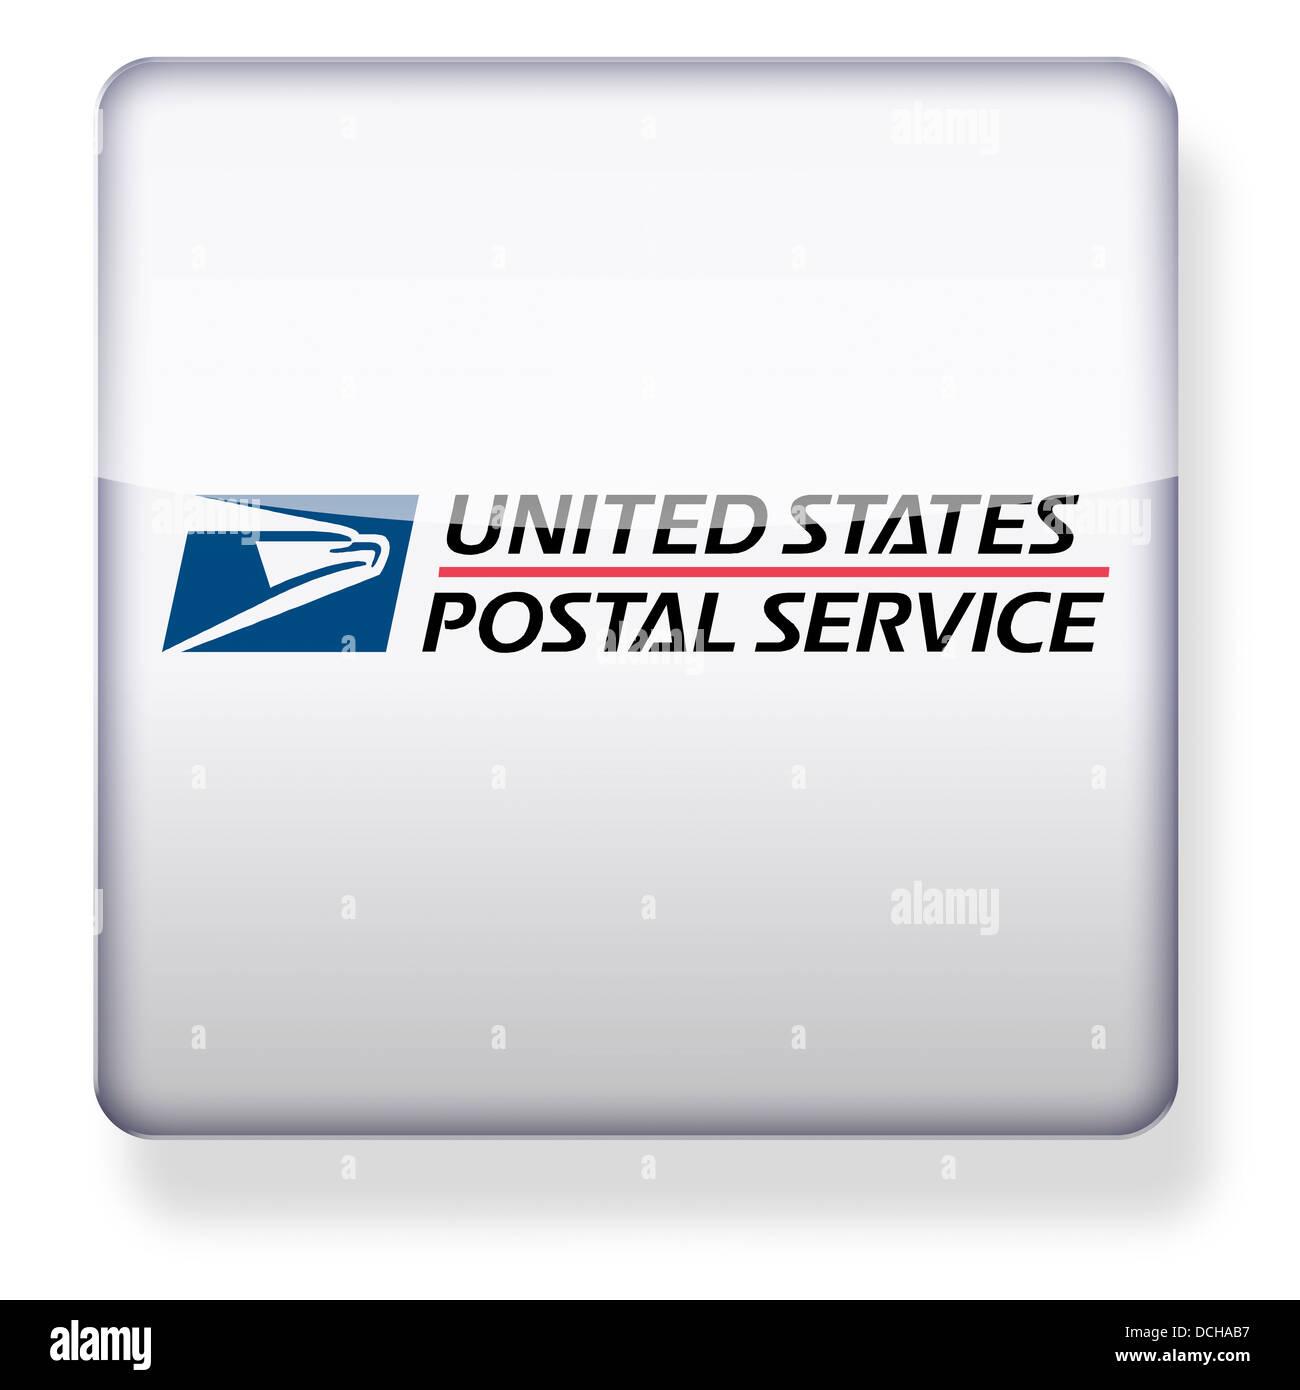 United states postal service logo as an app icon clipping path united states postal service logo as an app icon clipping path included buycottarizona